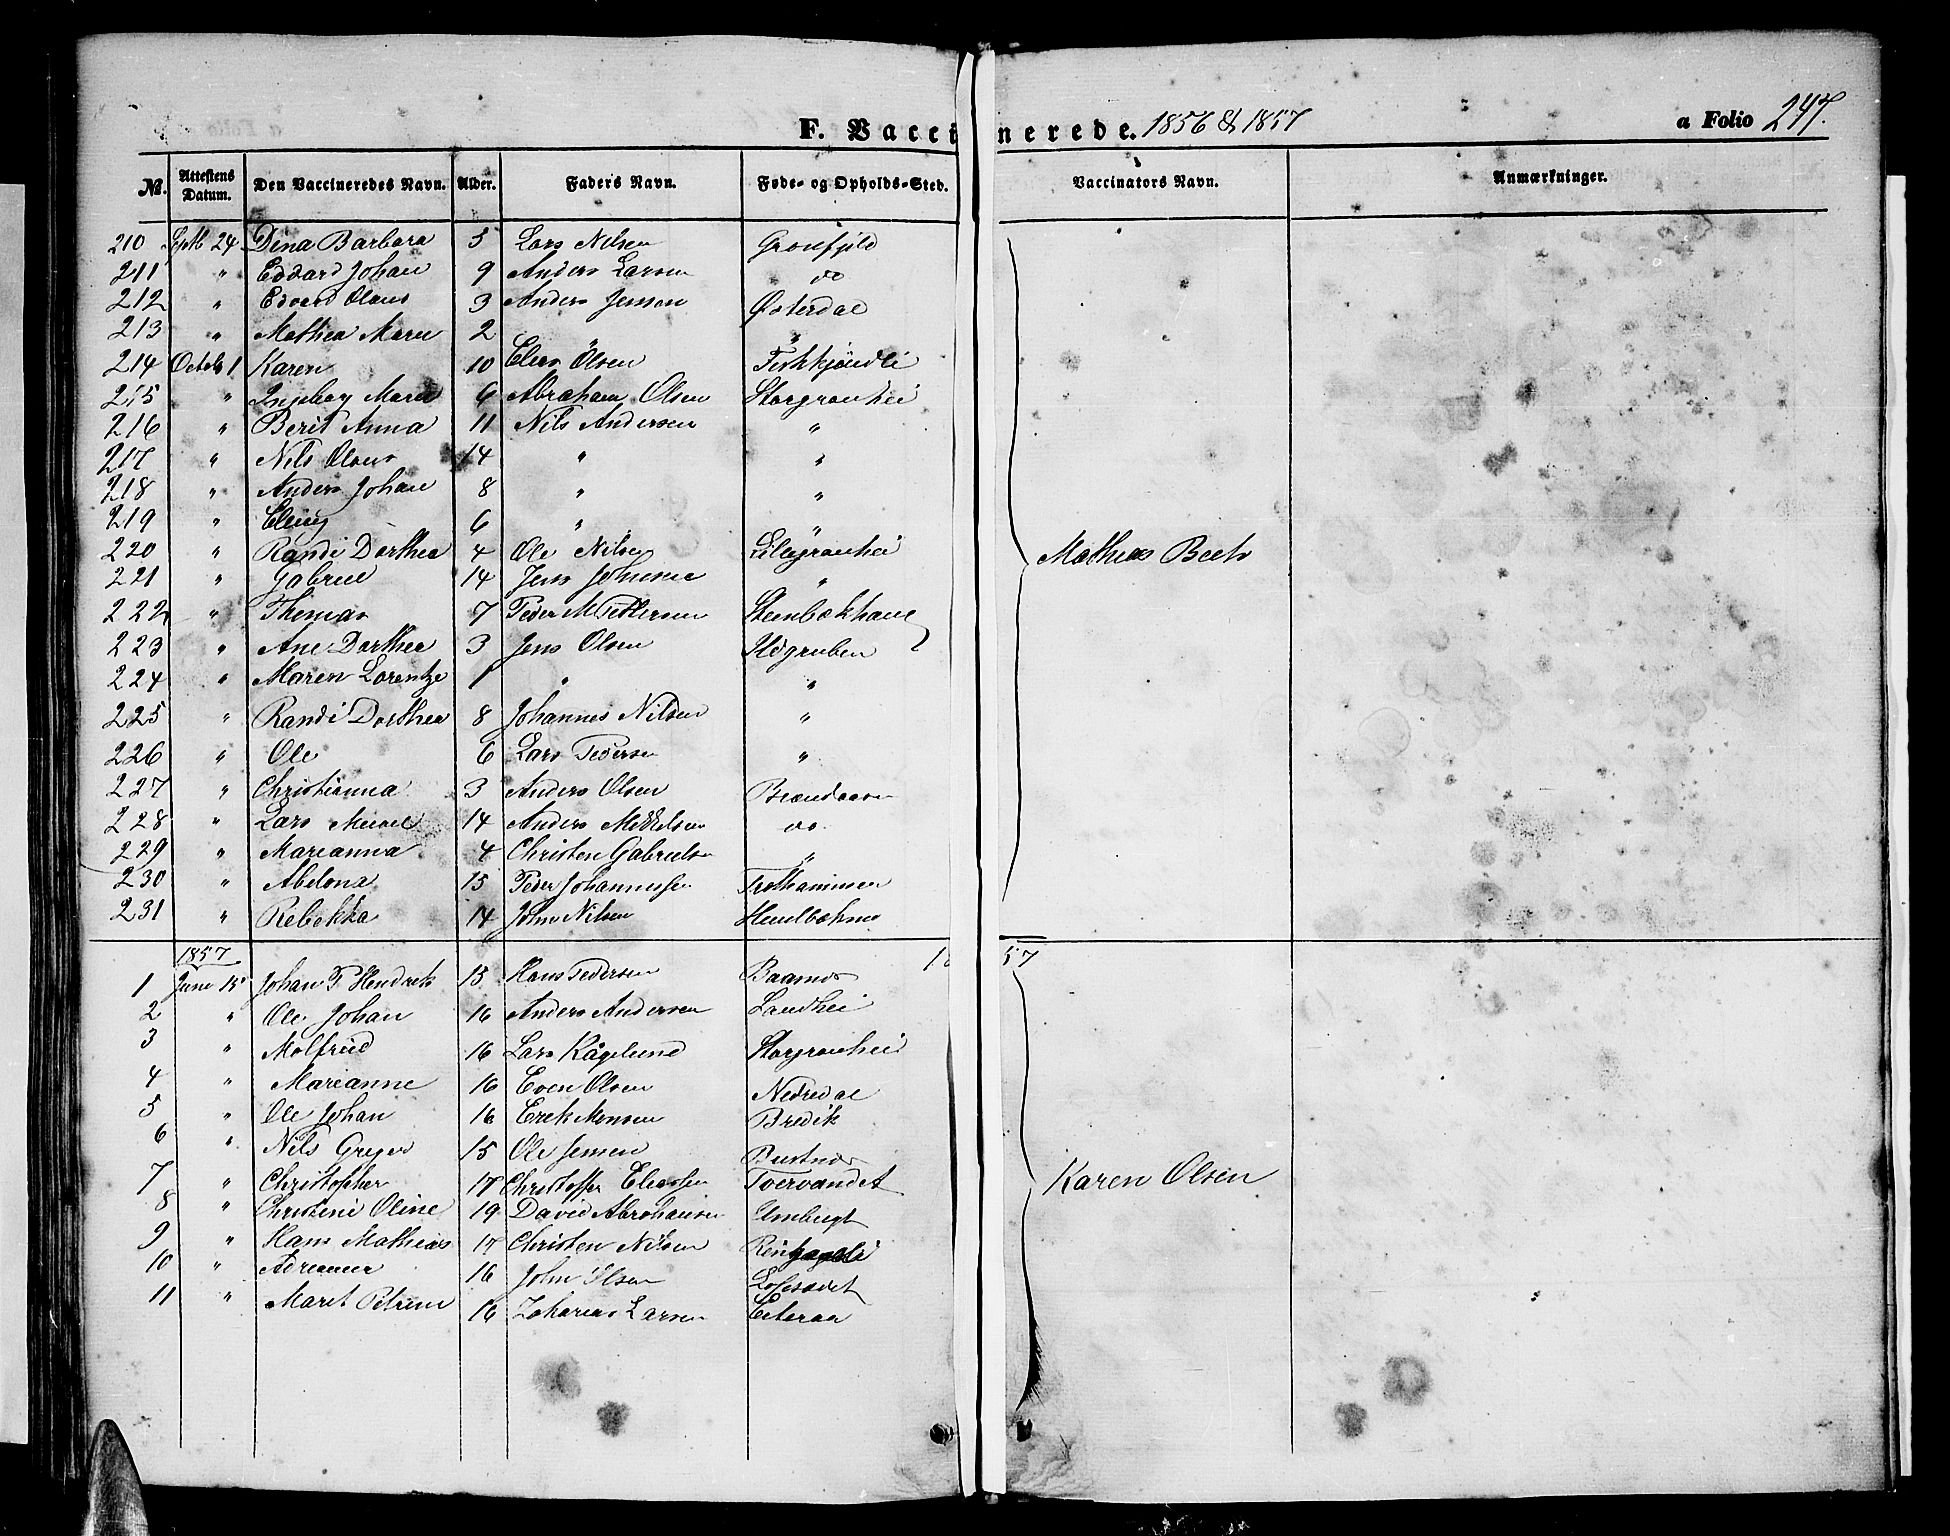 SAT, Ministerialprotokoller, klokkerbøker og fødselsregistre - Nordland, 827/L0414: Klokkerbok nr. 827C03, 1853-1865, s. 247